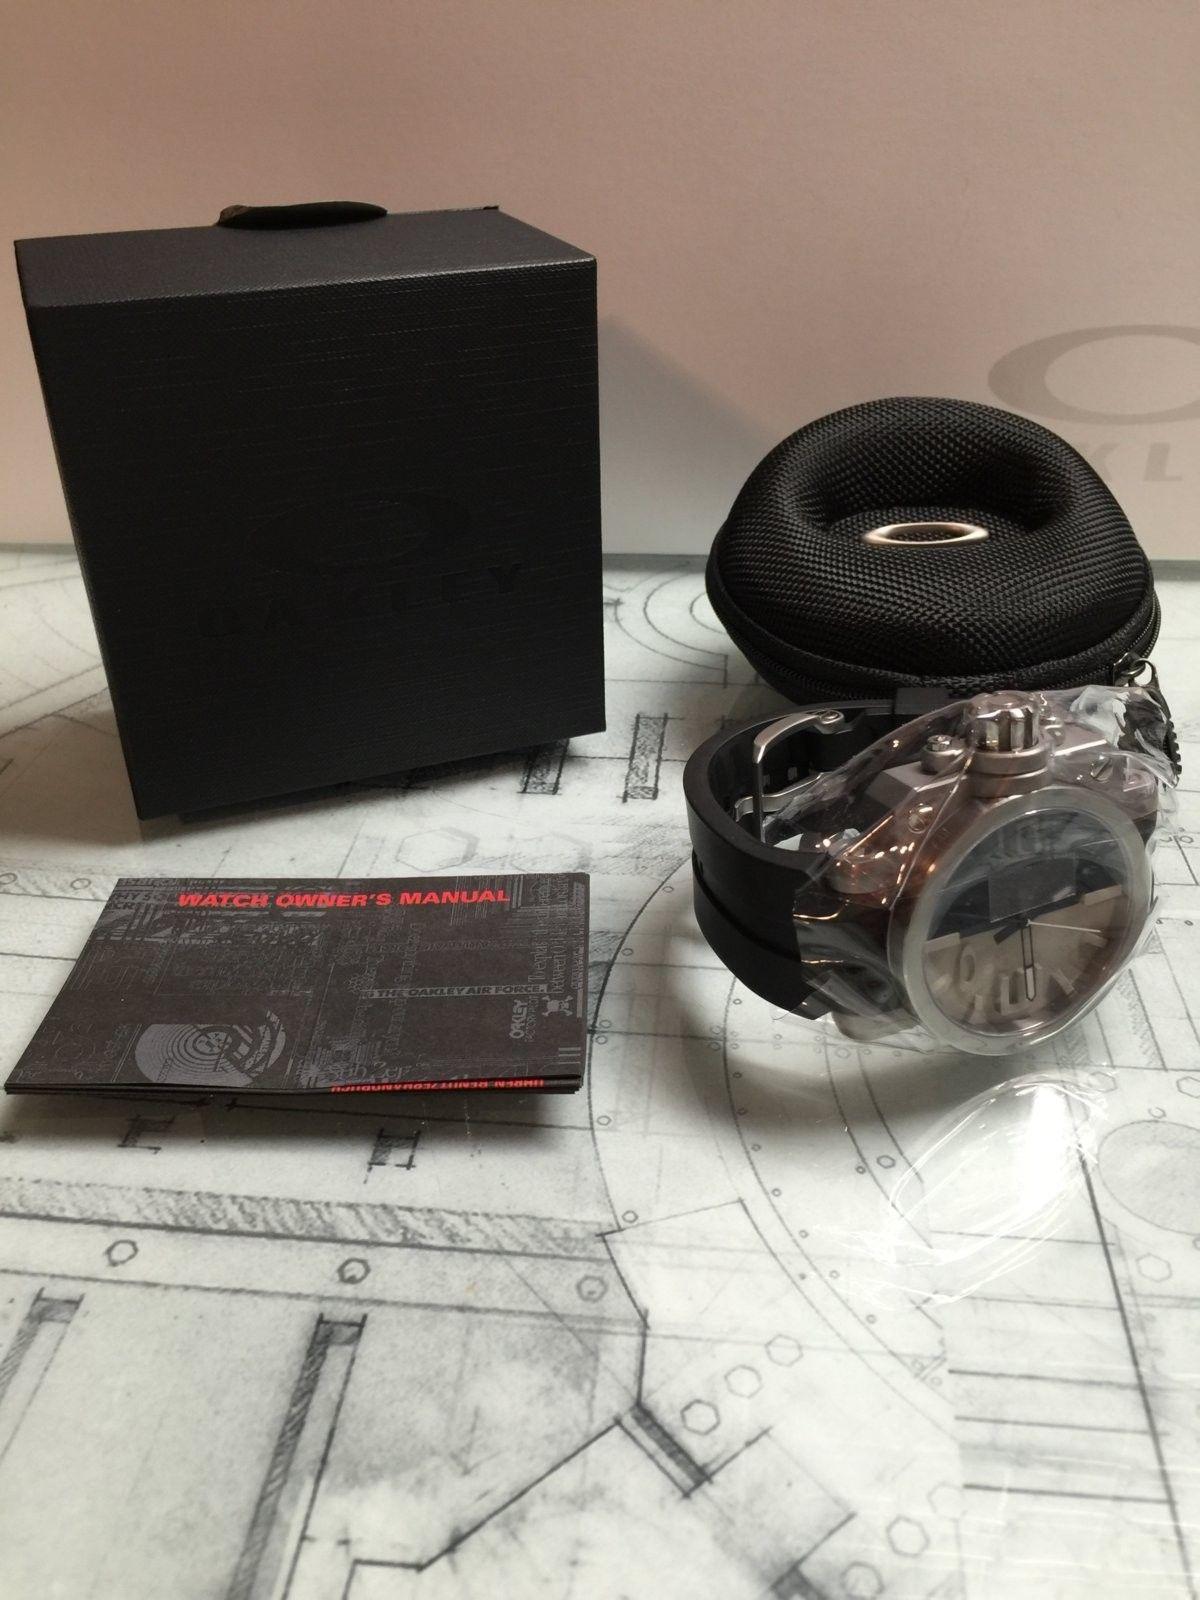 BNIB Brushed/Black/Tan GEARBOX watch - IMG_3299.JPG